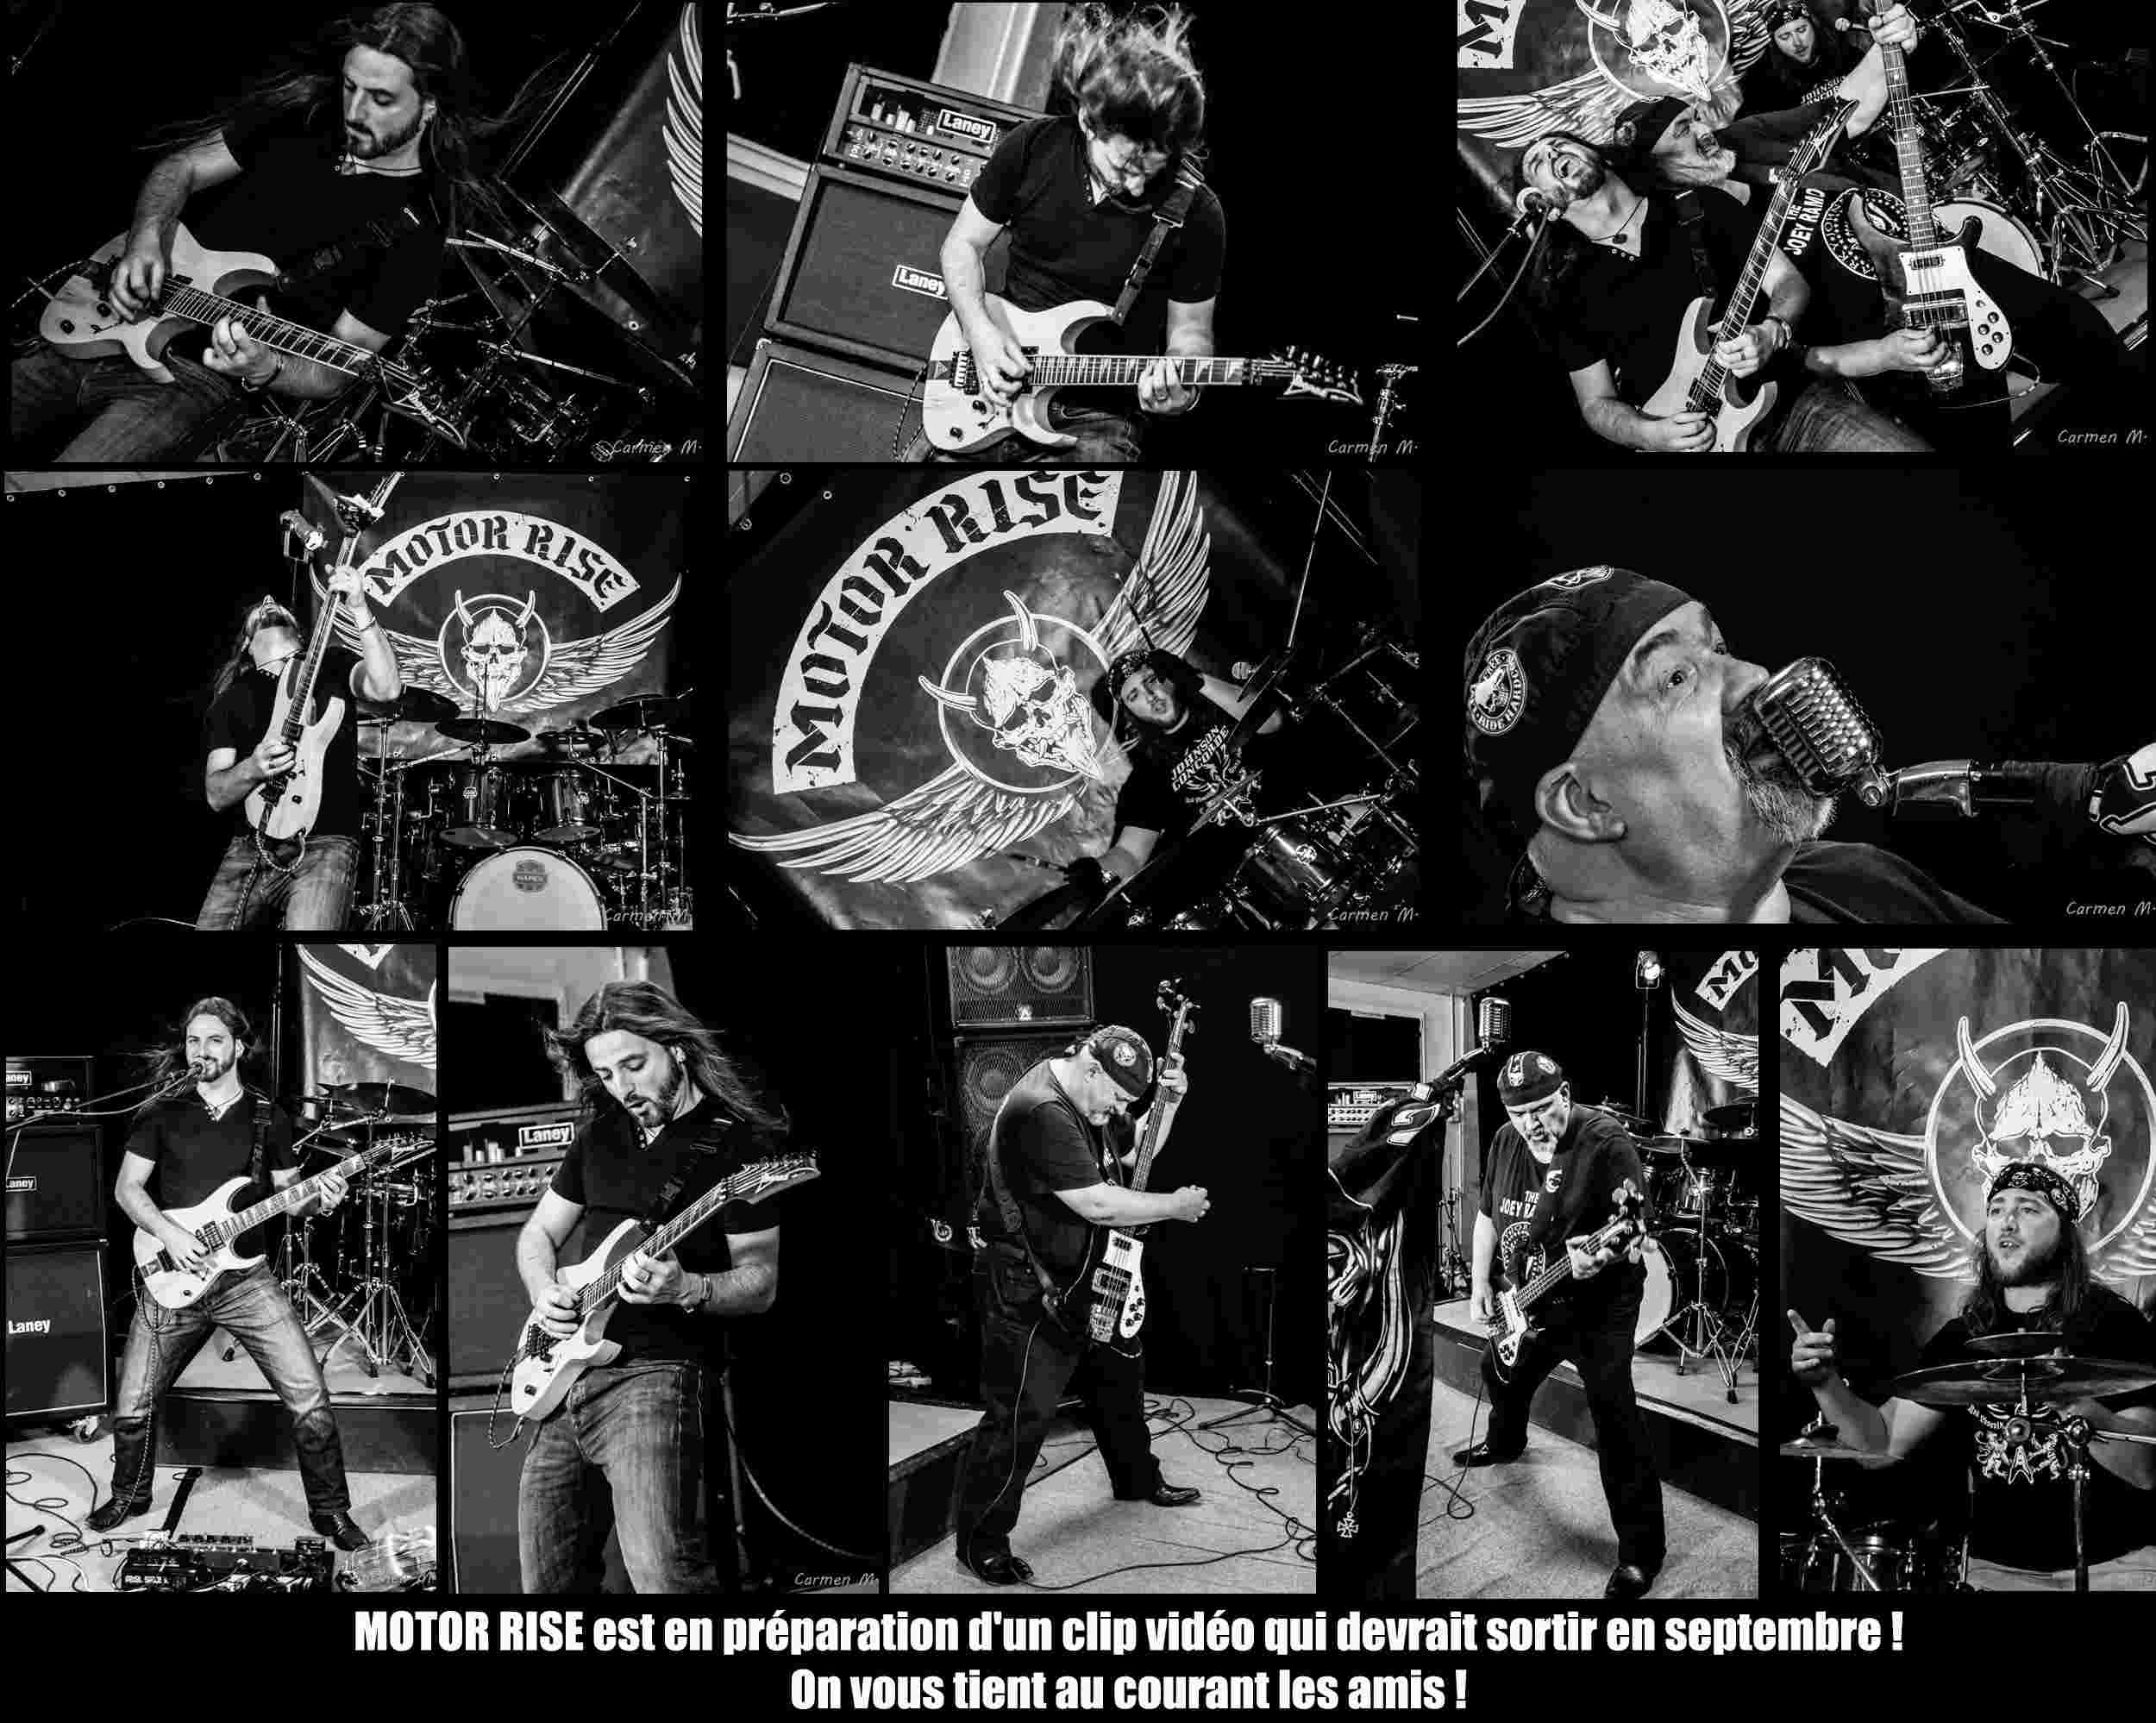 MOTOR RISE Faster Louder Faster (2015) EP Hard-Rock Sans_t10